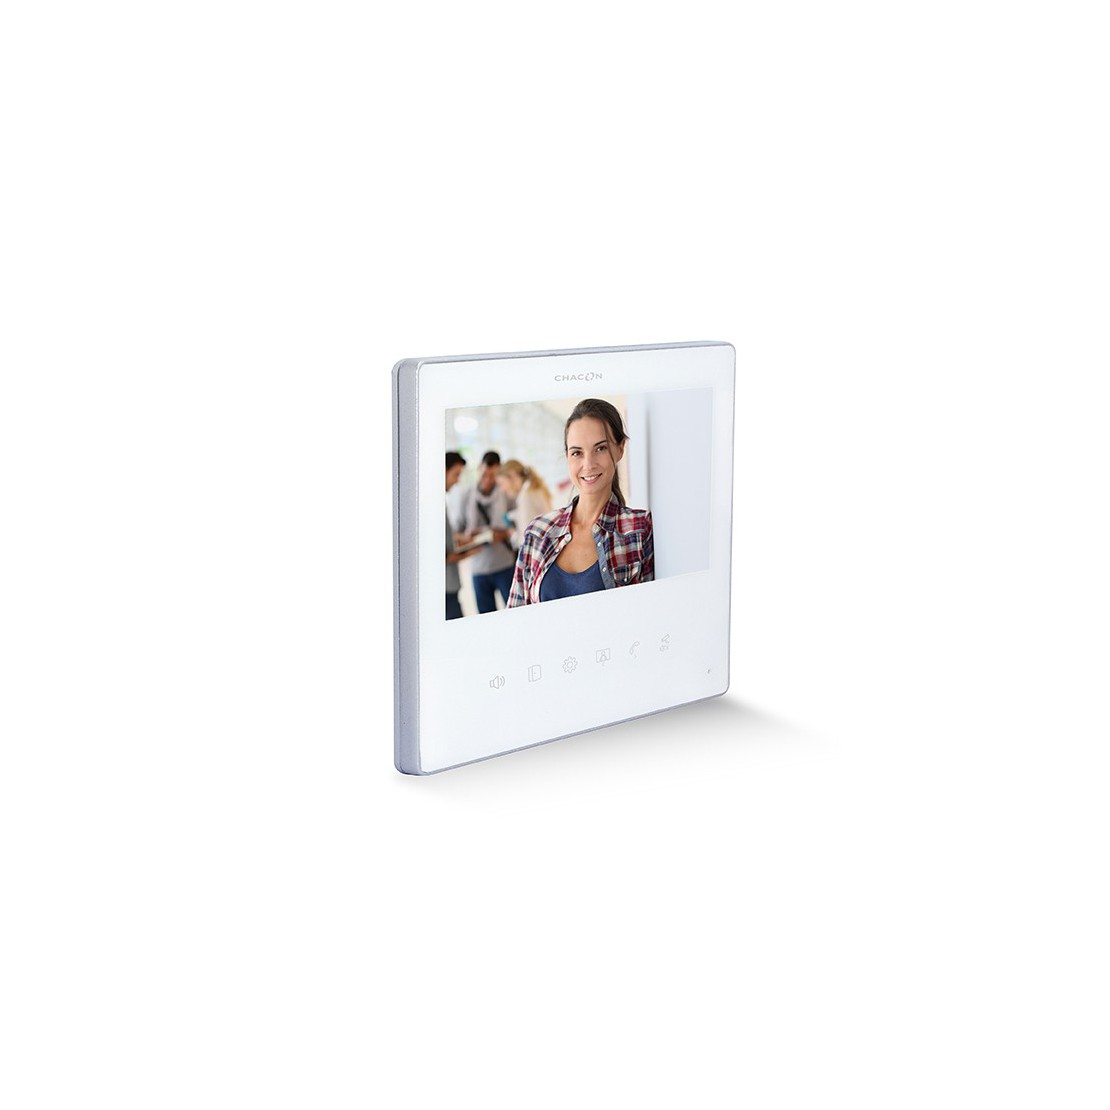 """Tela LCD 7"""" adicional - branco""Ultra Slim para 34844 & 34863"